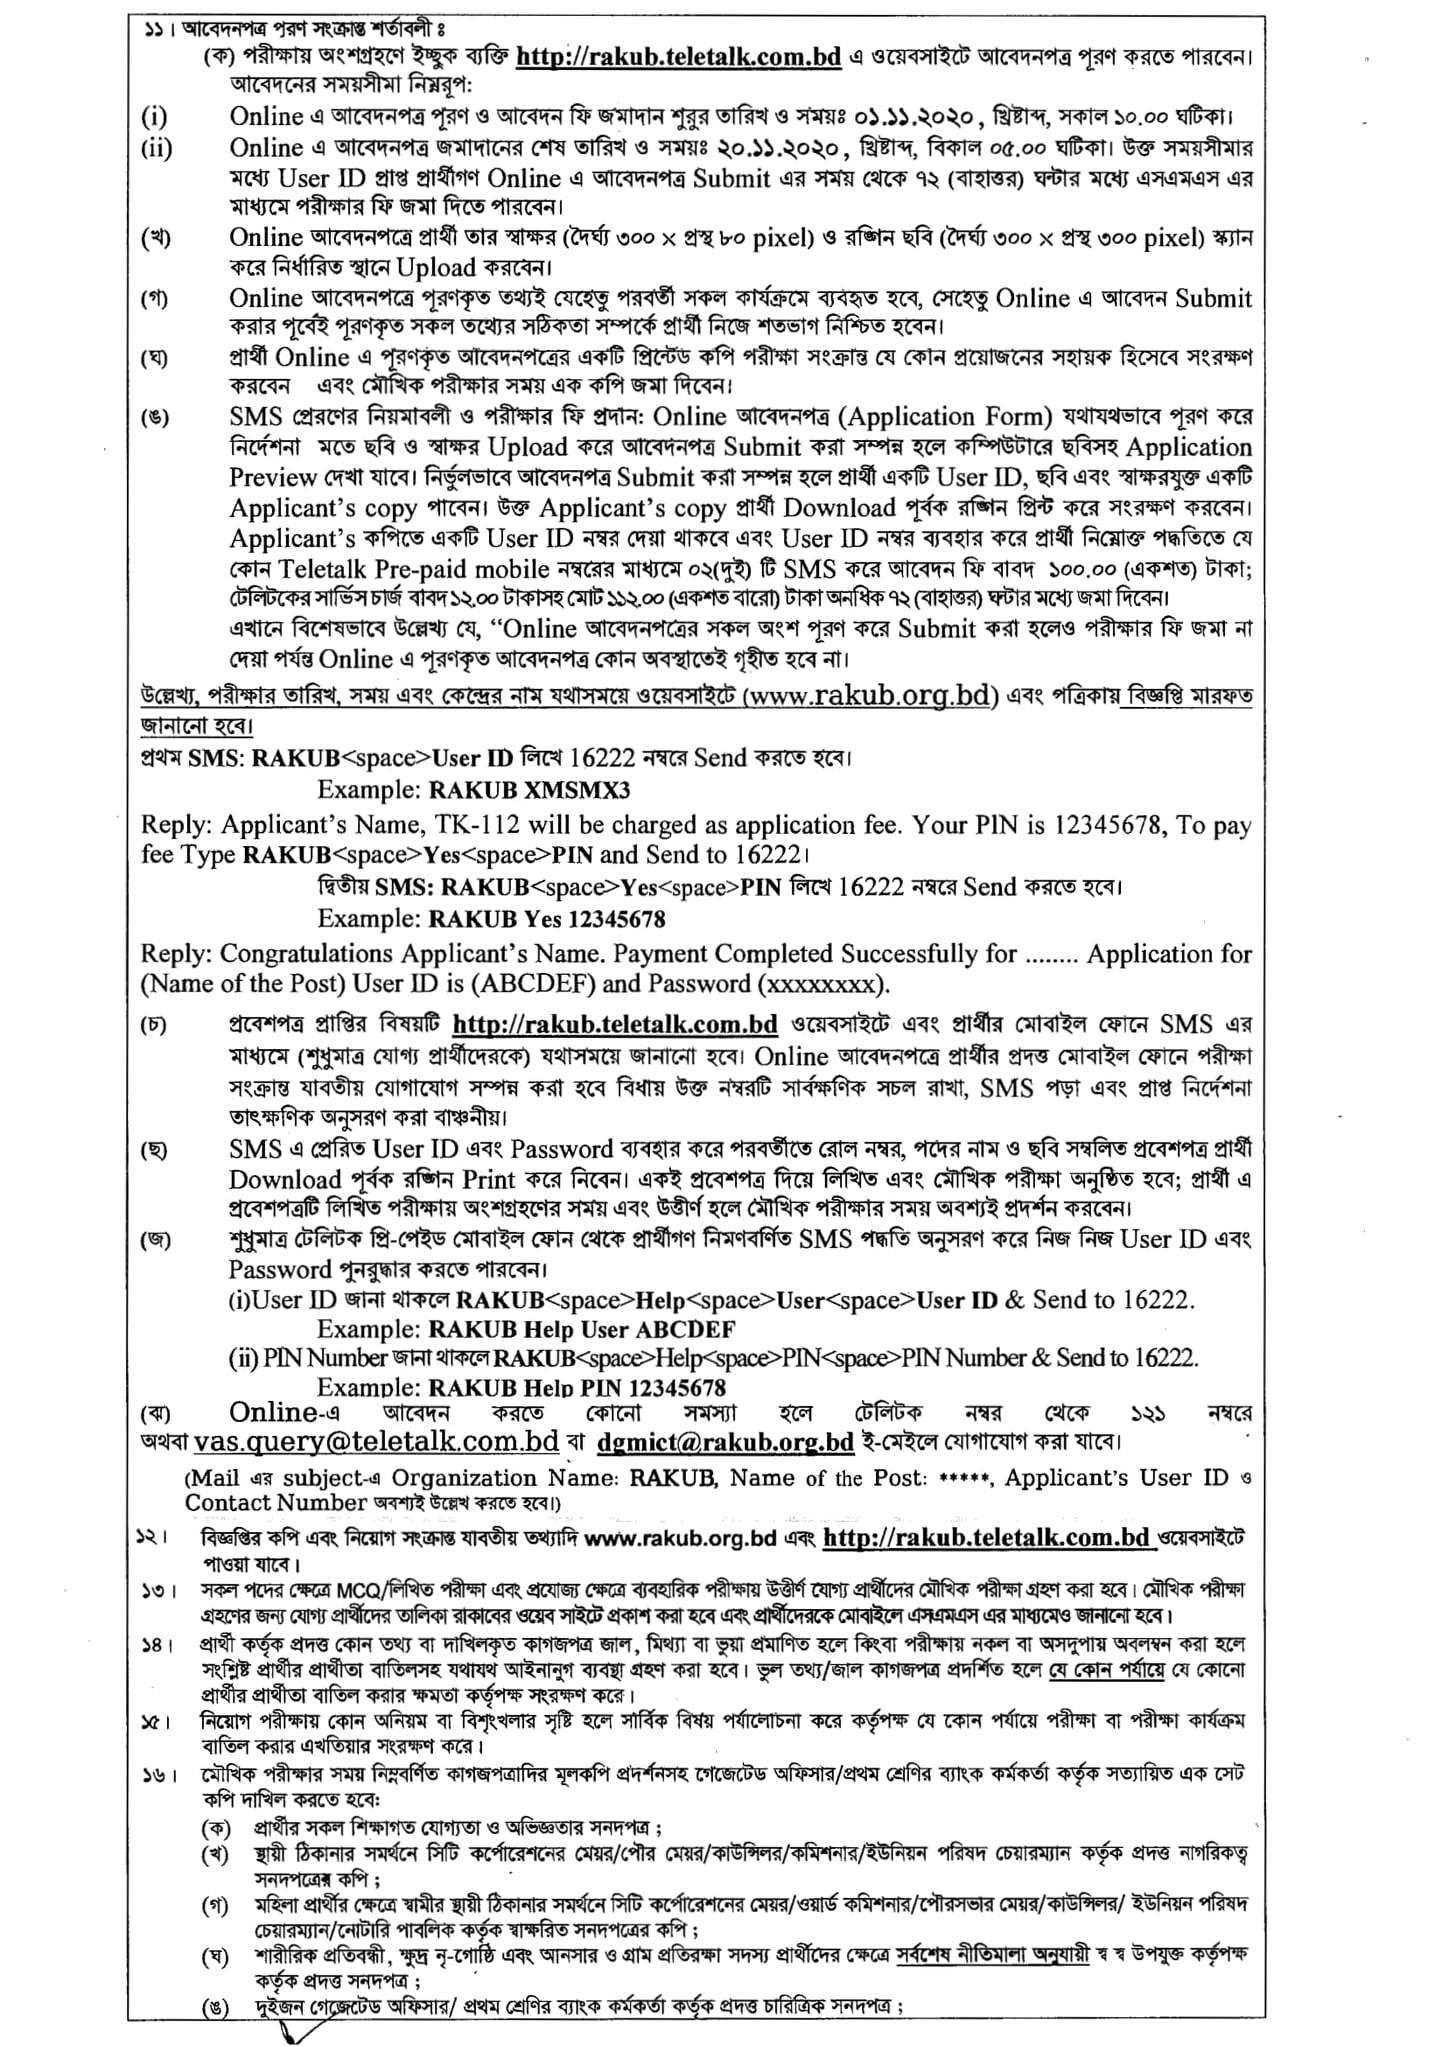 Rajshahi-Krishi-Unnayan-Bank-job-circular-2020-learninghomebd-02